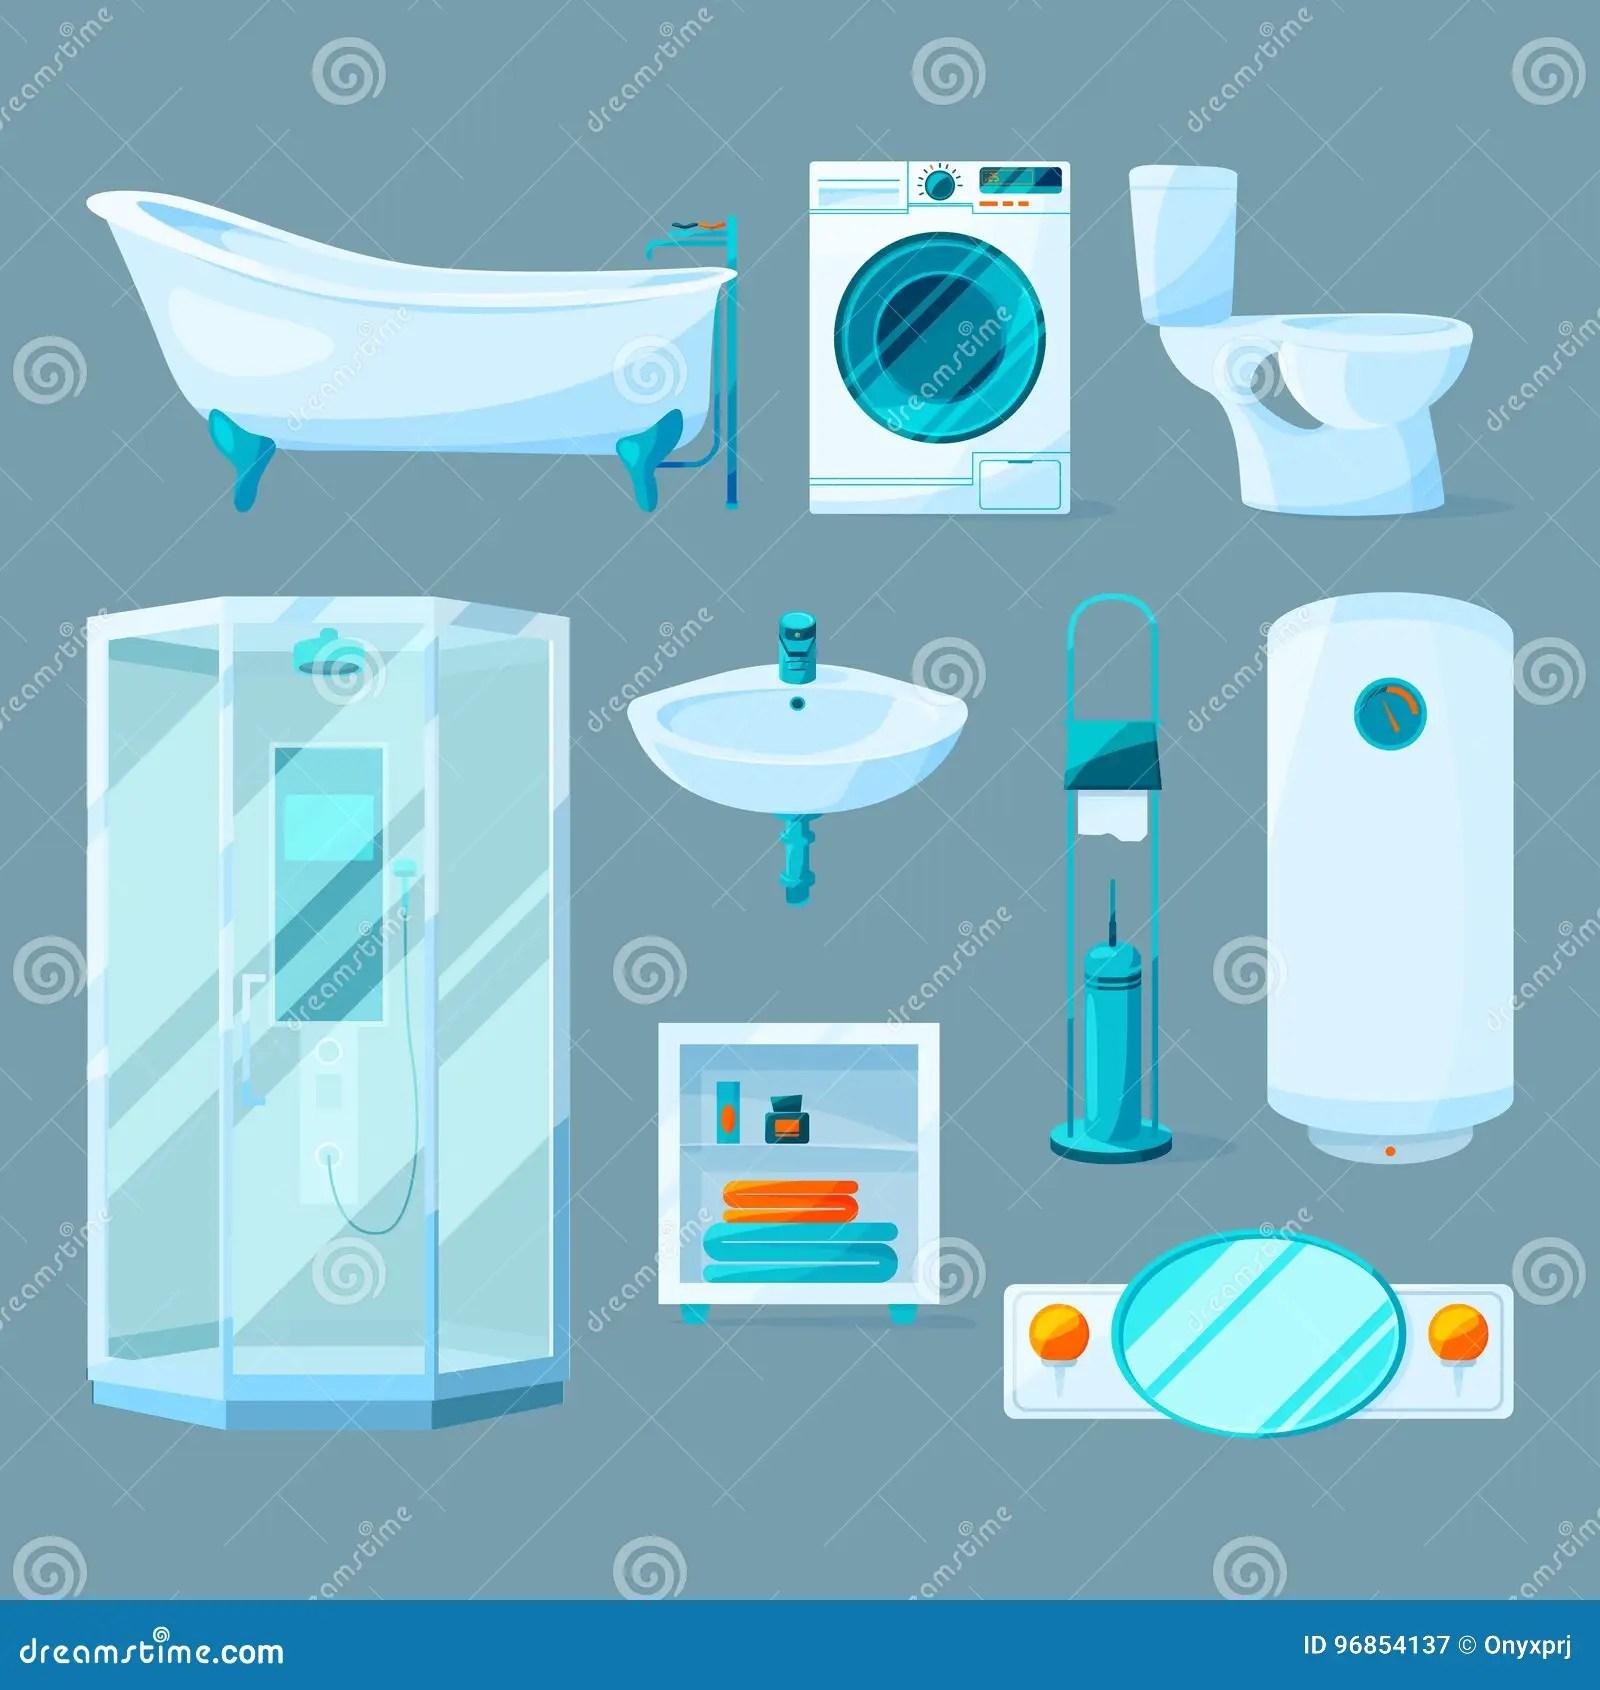 Cartoon Home Washroom Sink Vector Illustration  CartoonDealercom 23446114